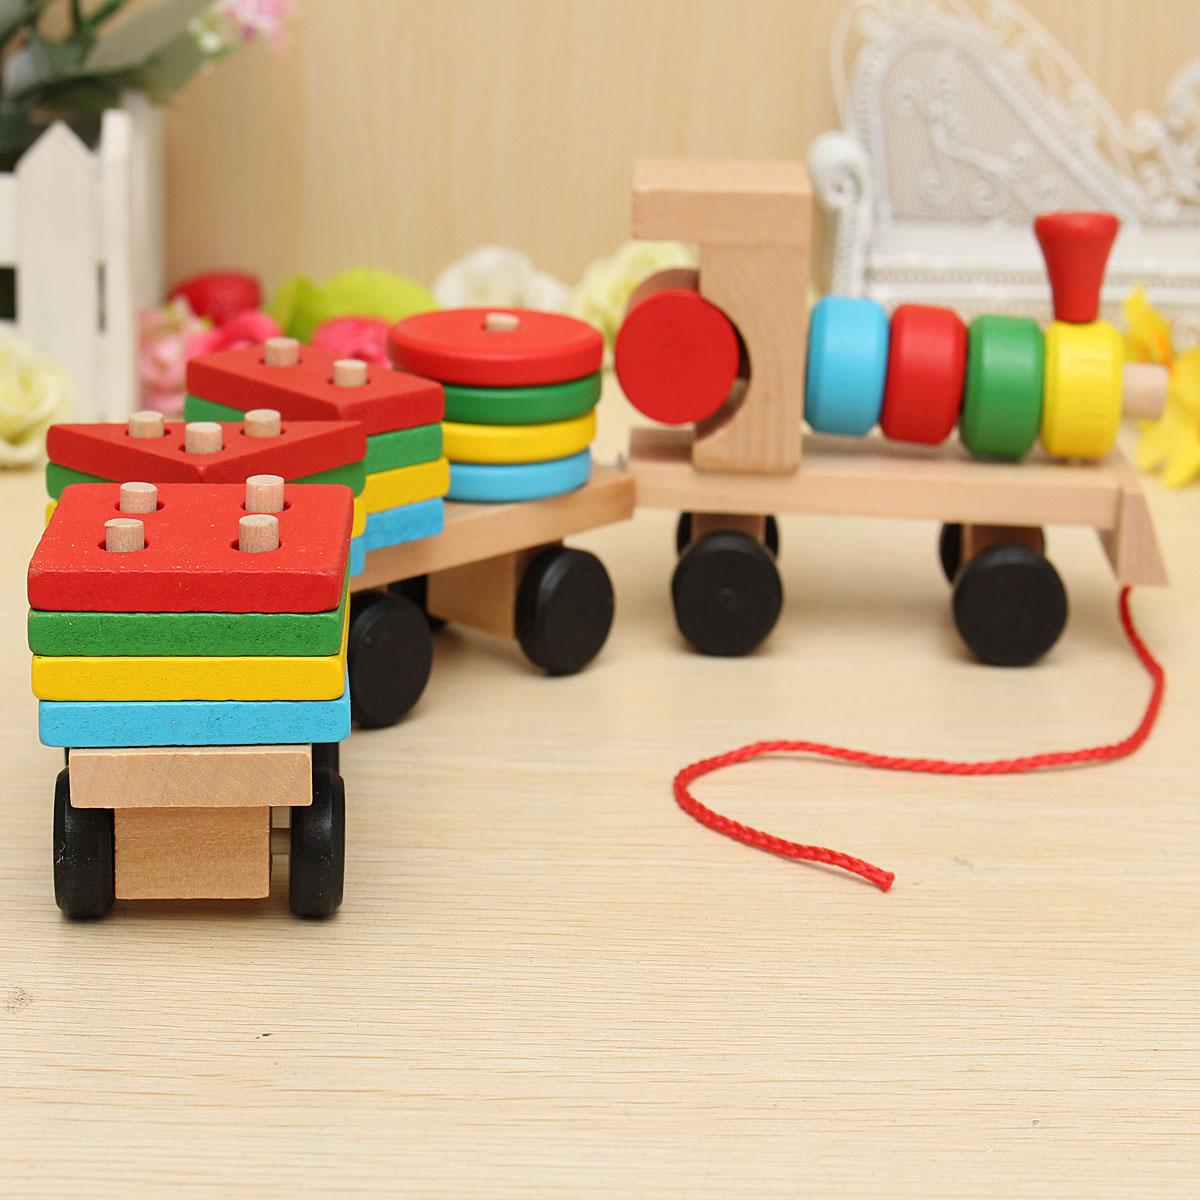 New Children's Educational Toy Wood Bricks Train Toys ...